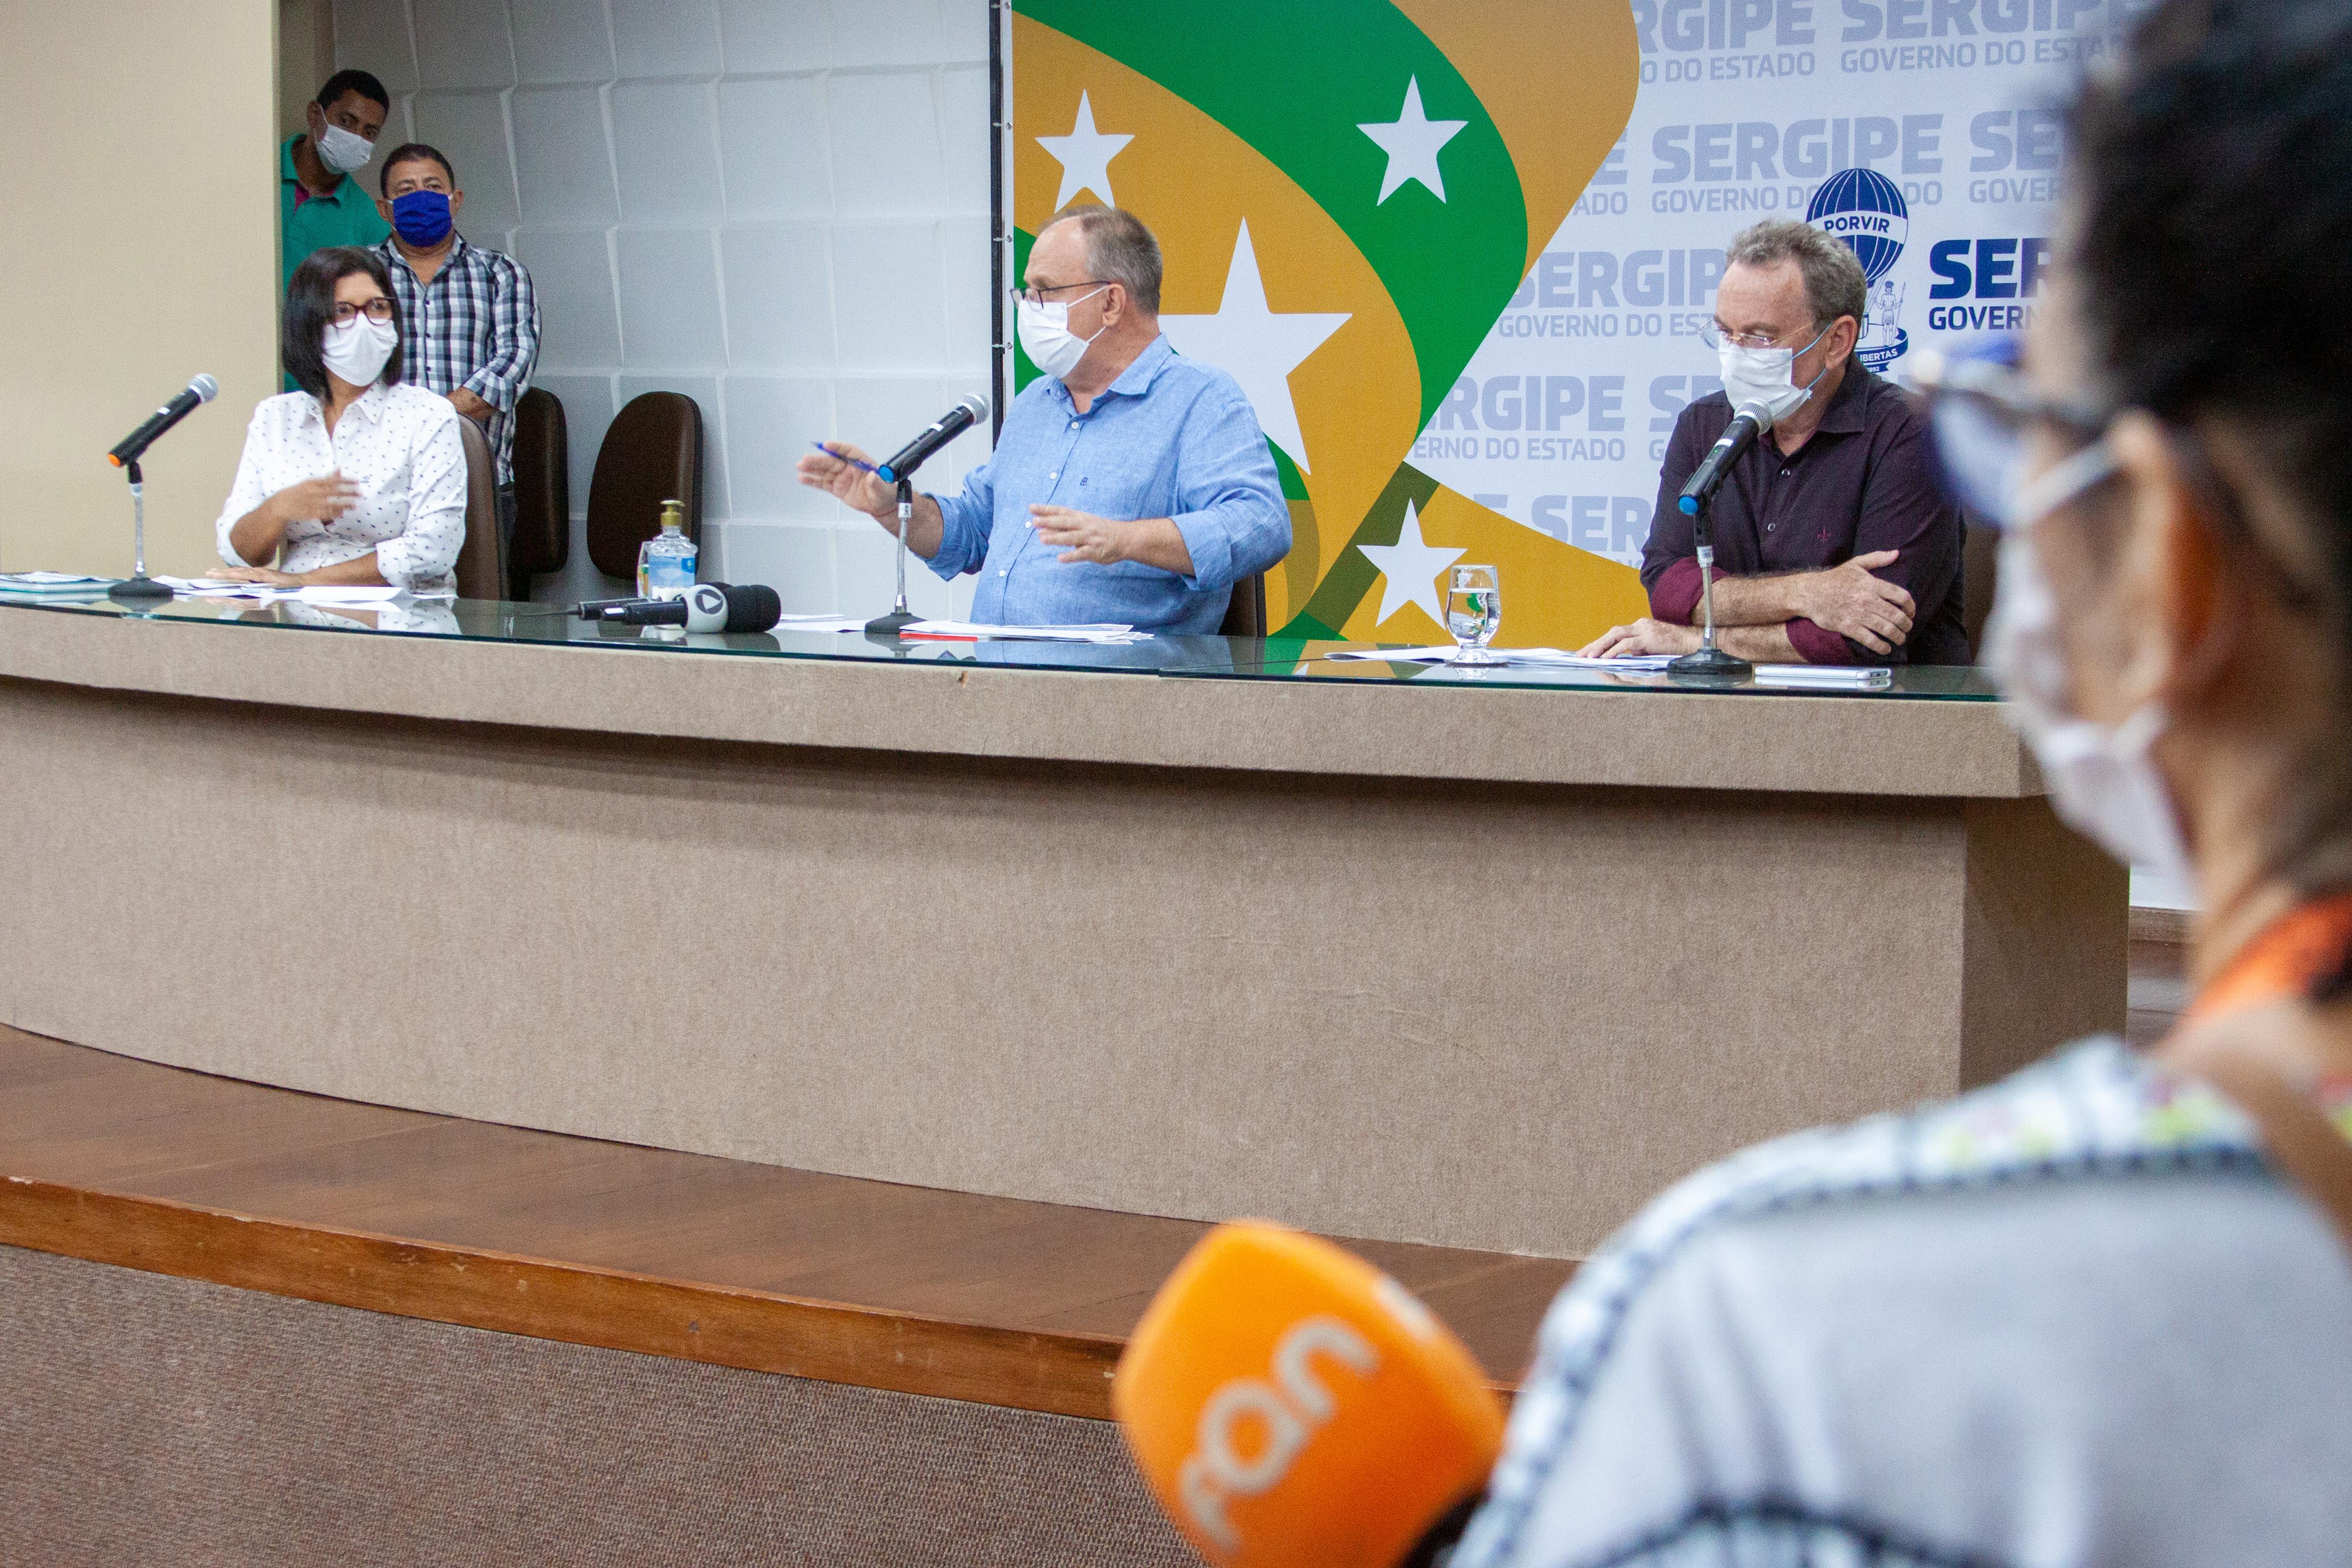 CORONAVÍRUS: GOVERNO DE SERGIPE DETERMINA OBRIGATORIEDADE DO USO DE MÁSCARA